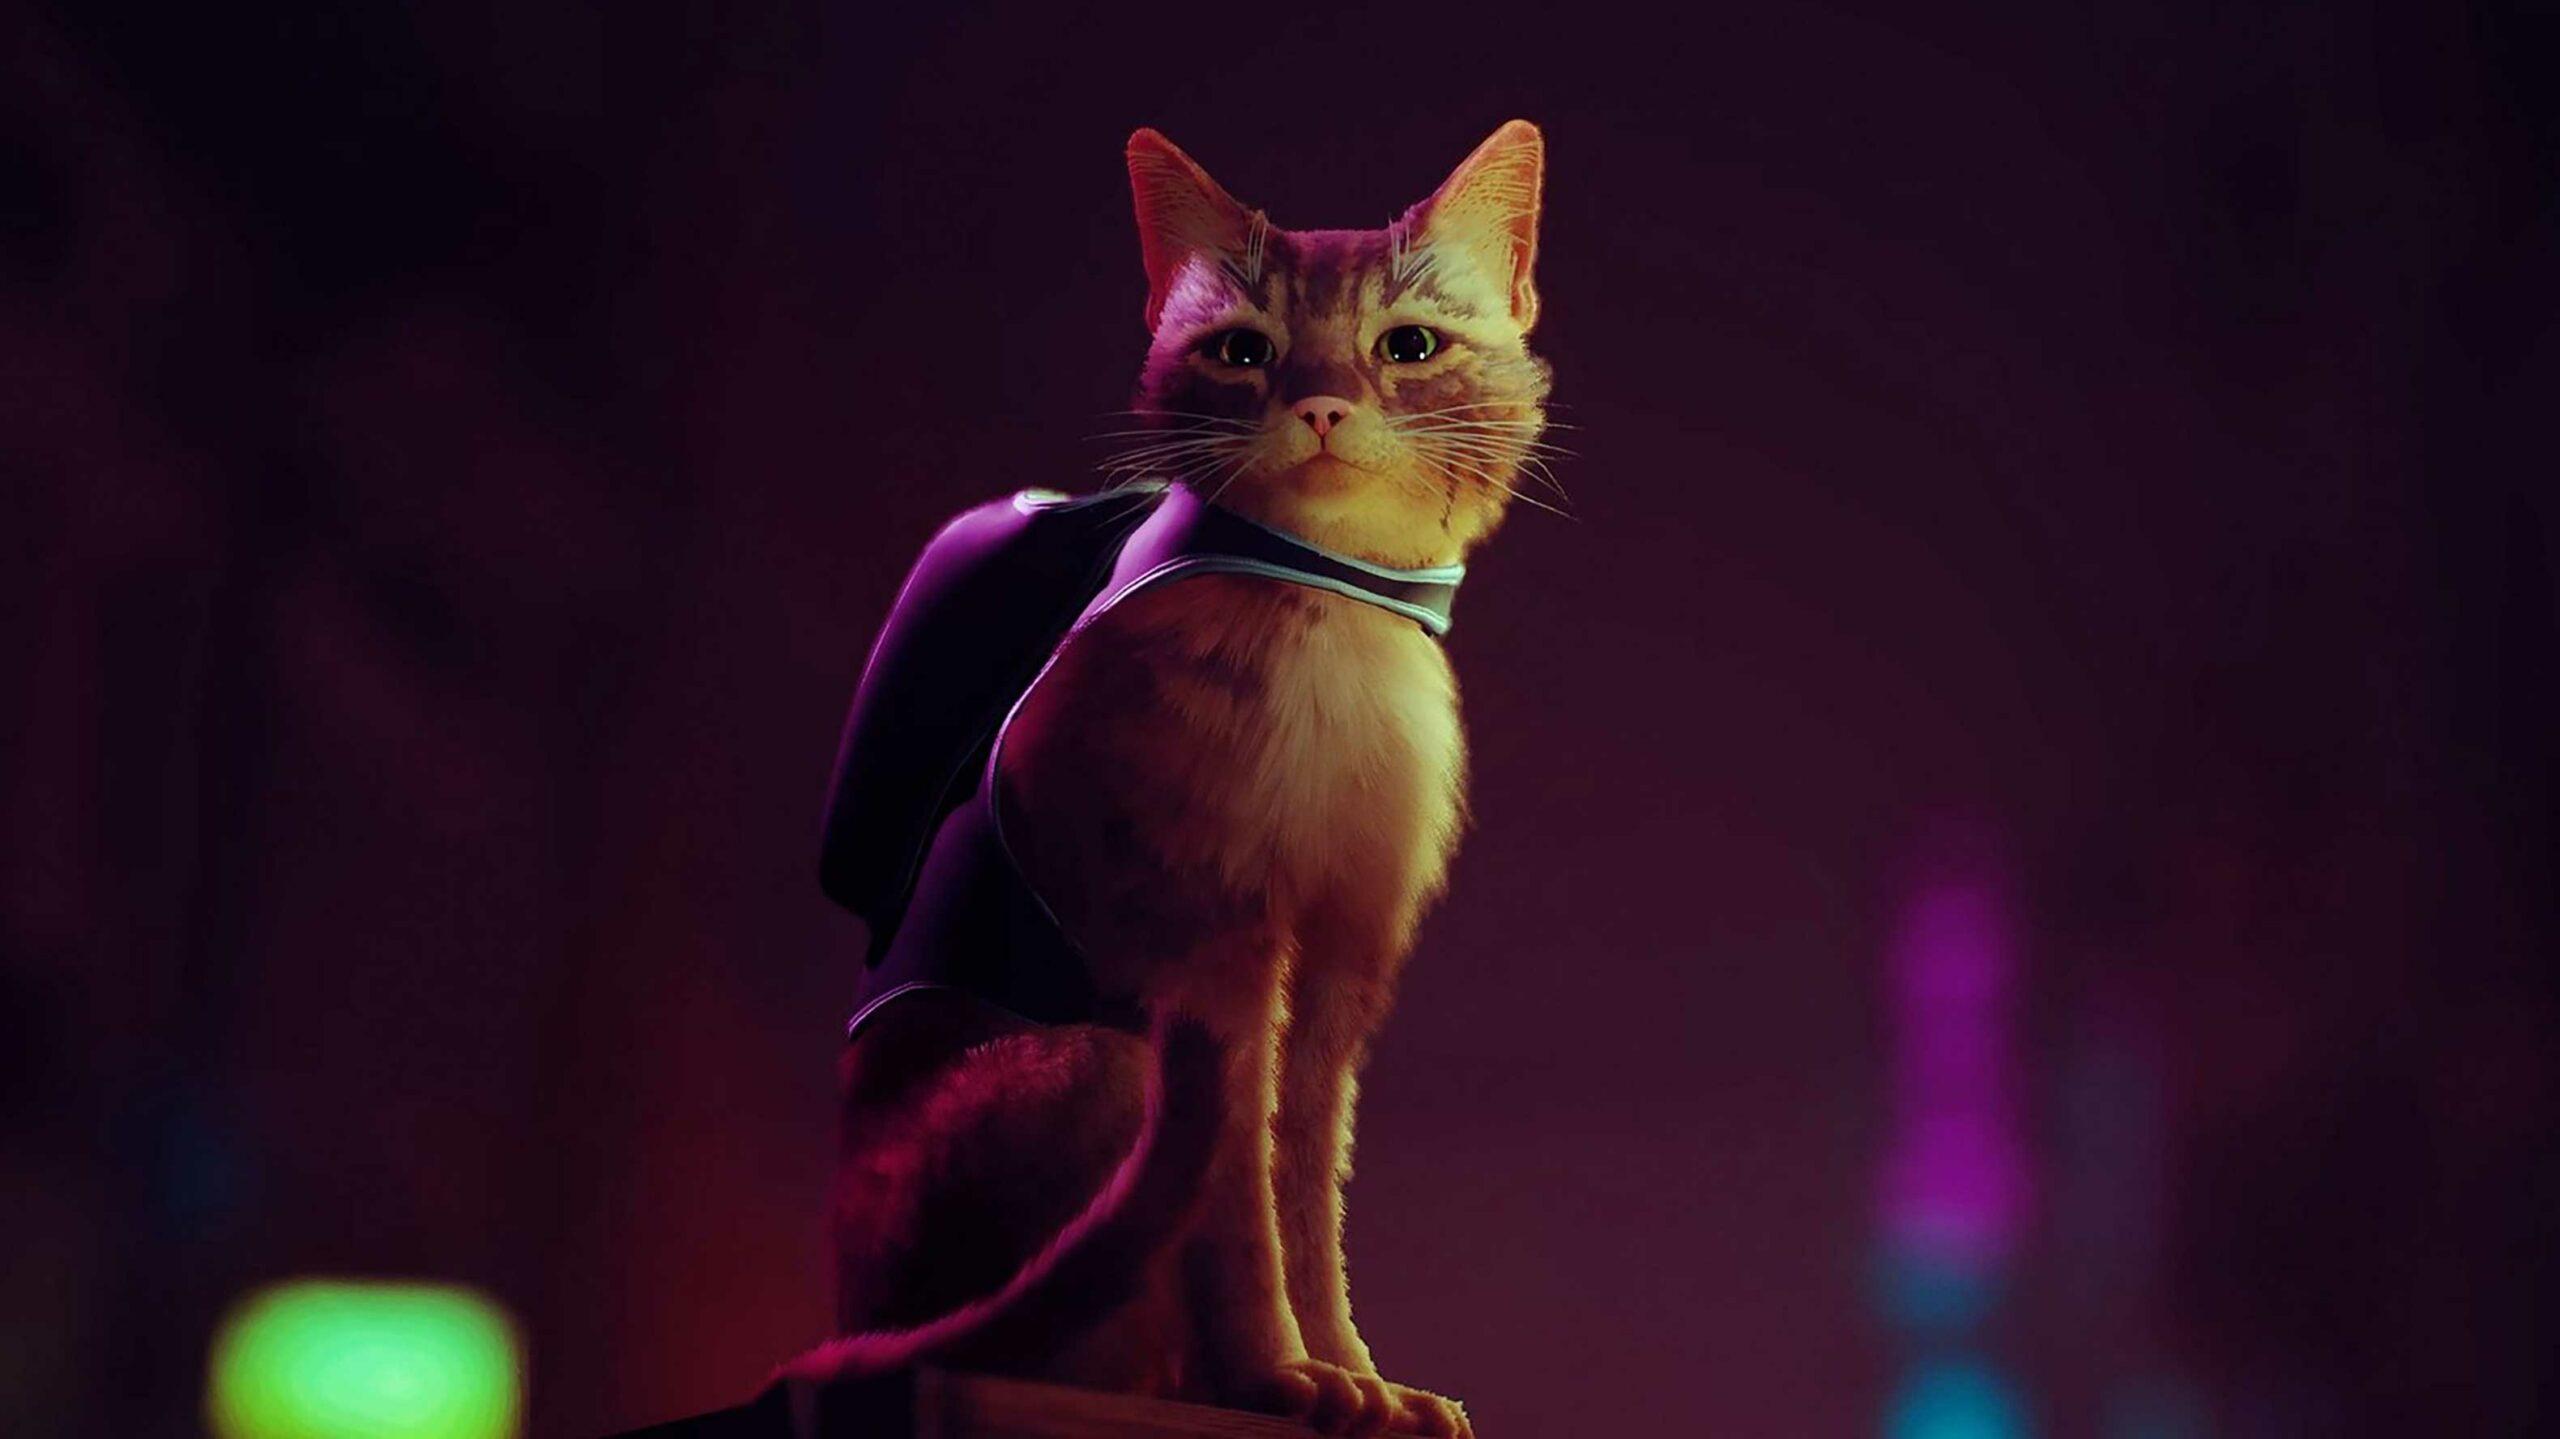 Stray game cat